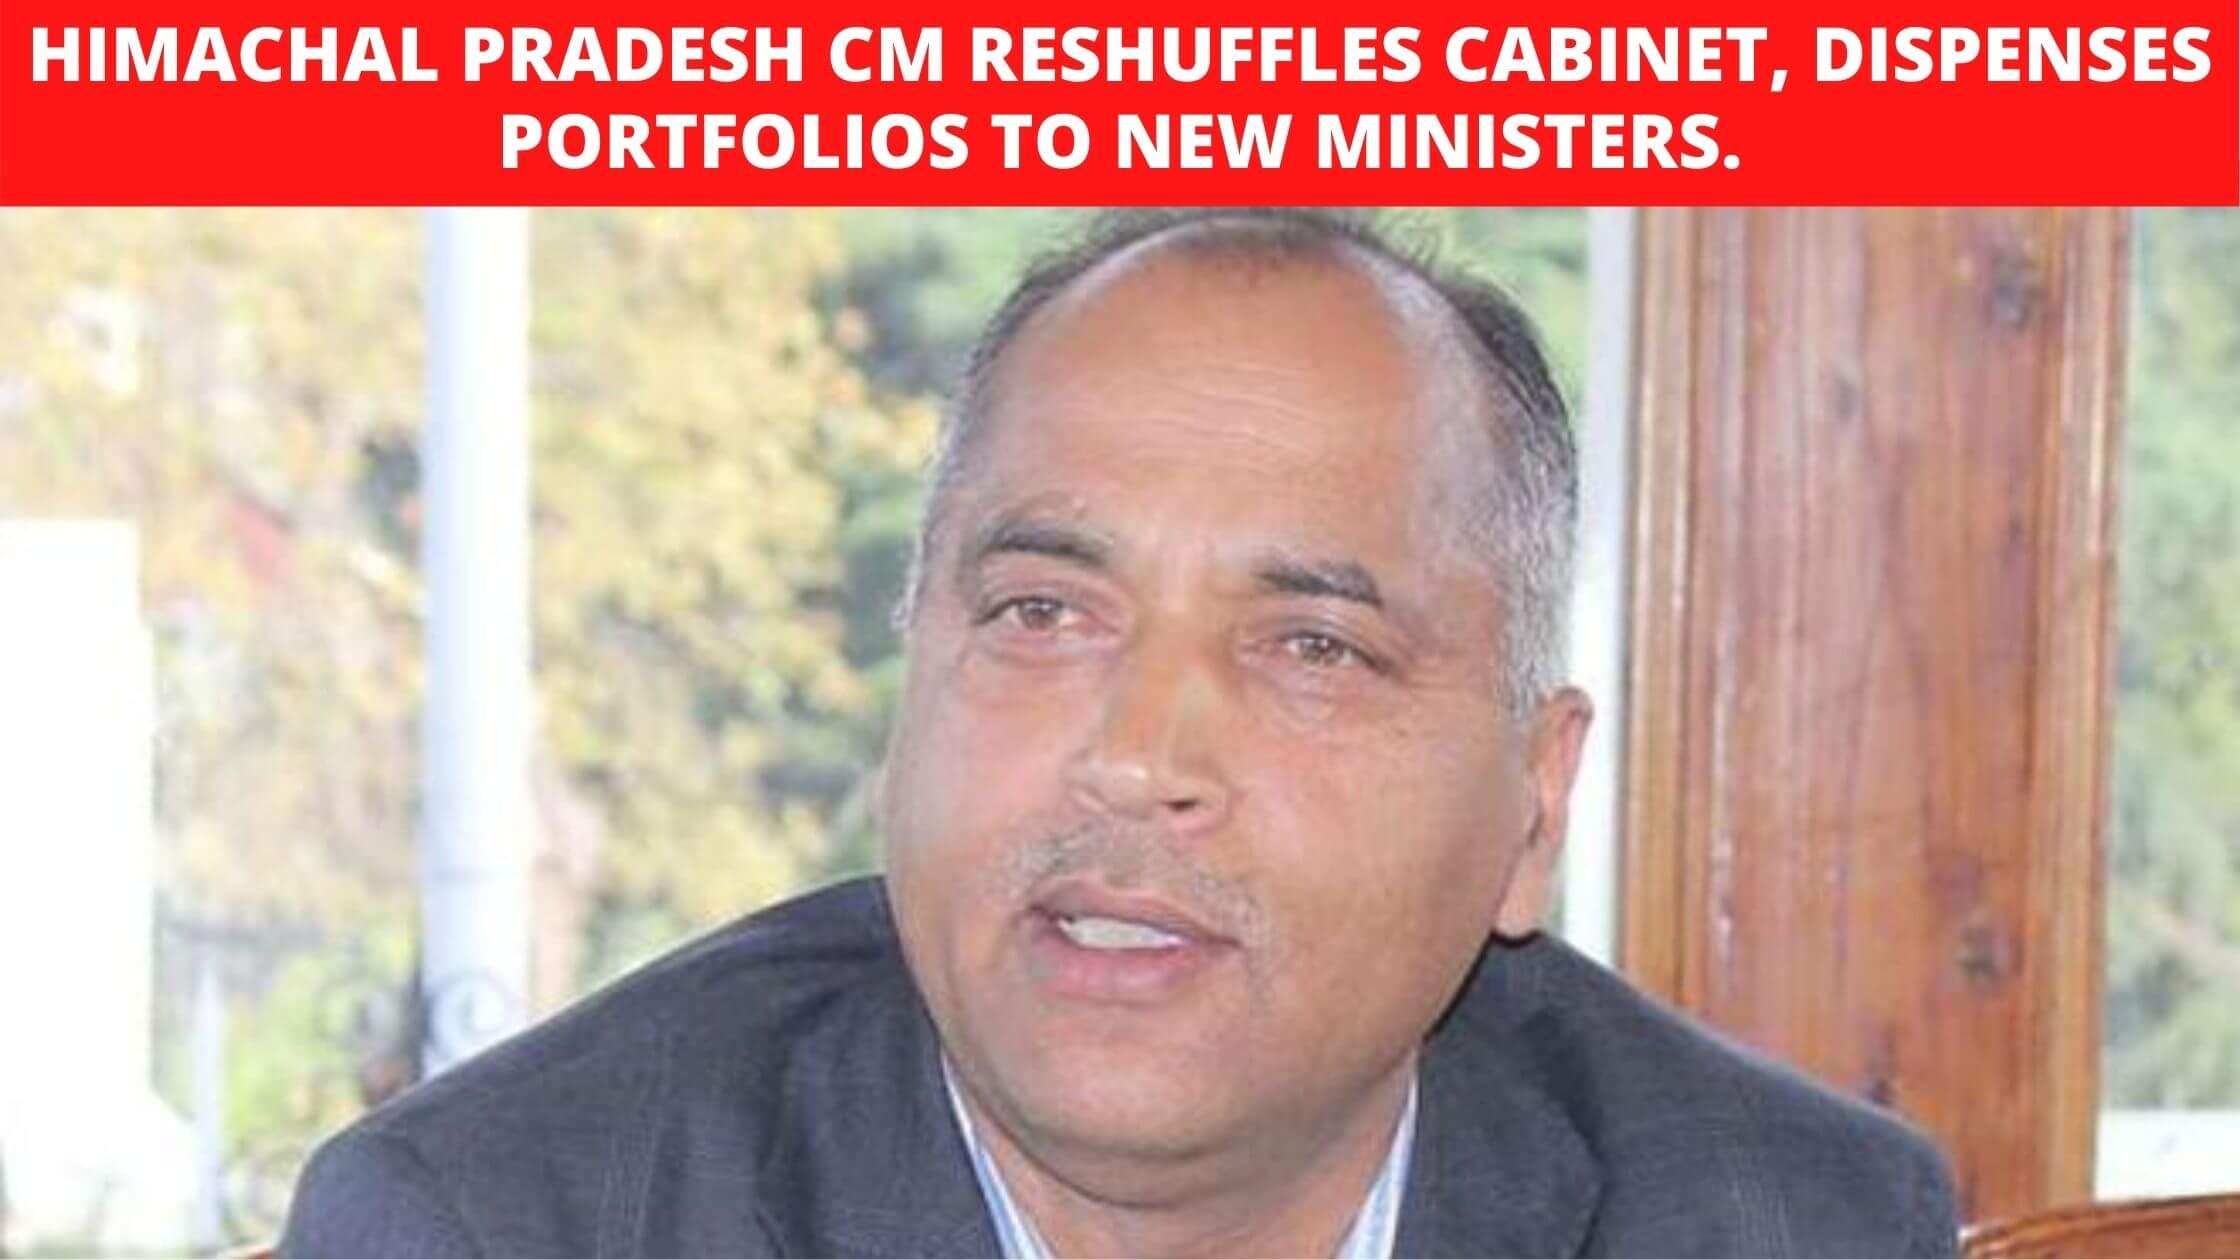 Himachal Pradesh CM reshuffles Cabinet, dispenses portfolios to new Ministers